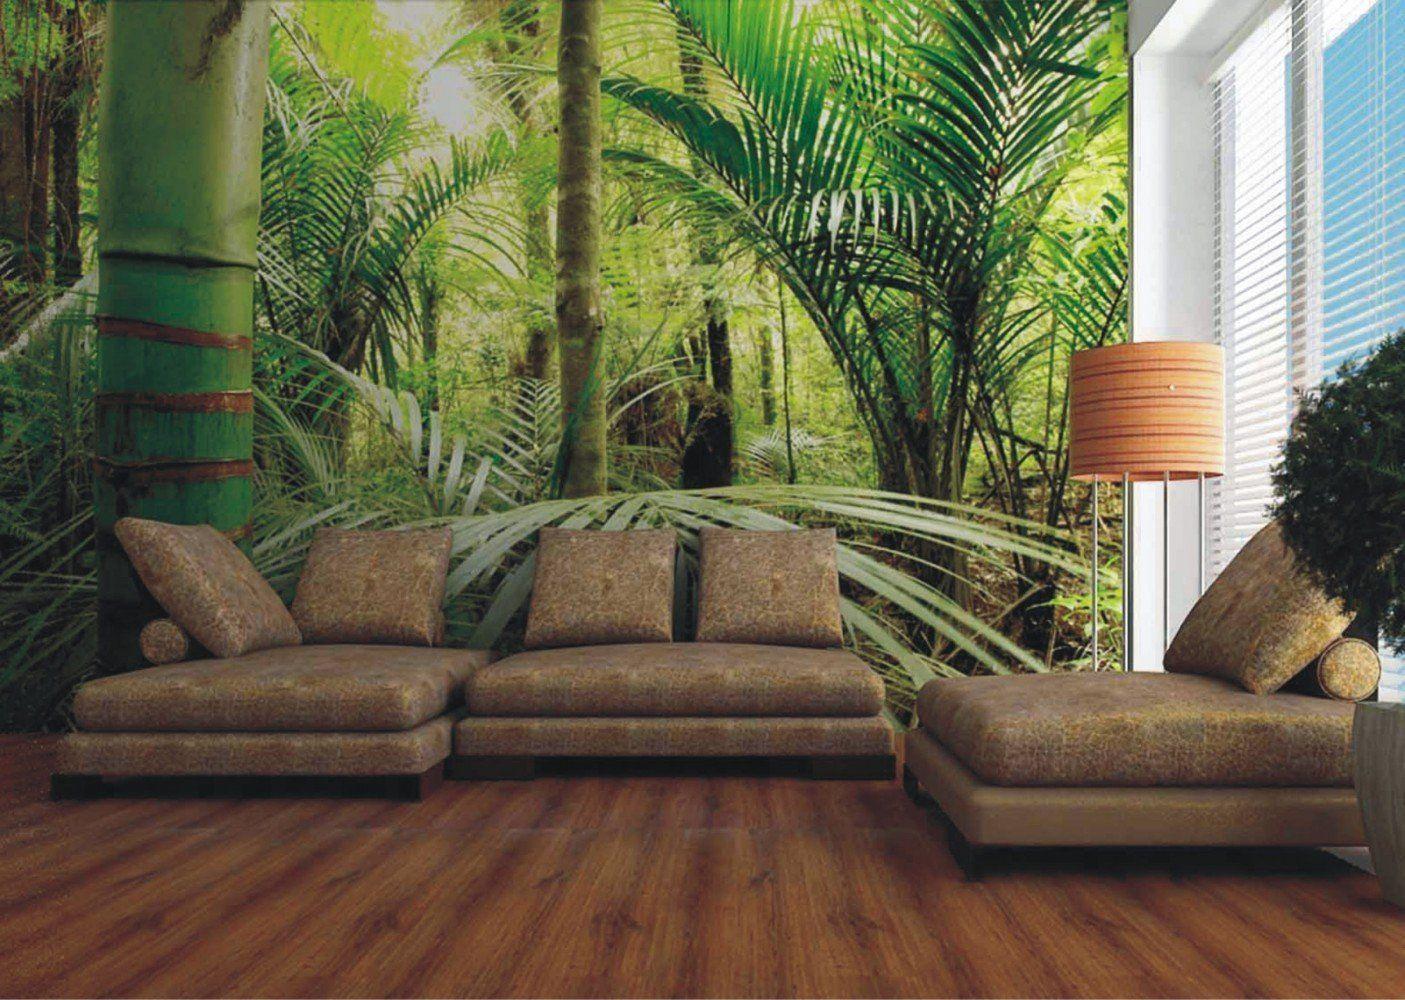 Fototapete Tapete Natur Dschungel Wildniss Pflanzen Foto 360 Cm X 270 Cm Amazon De Baumarkt Fototapete Tapeten Wandtapete